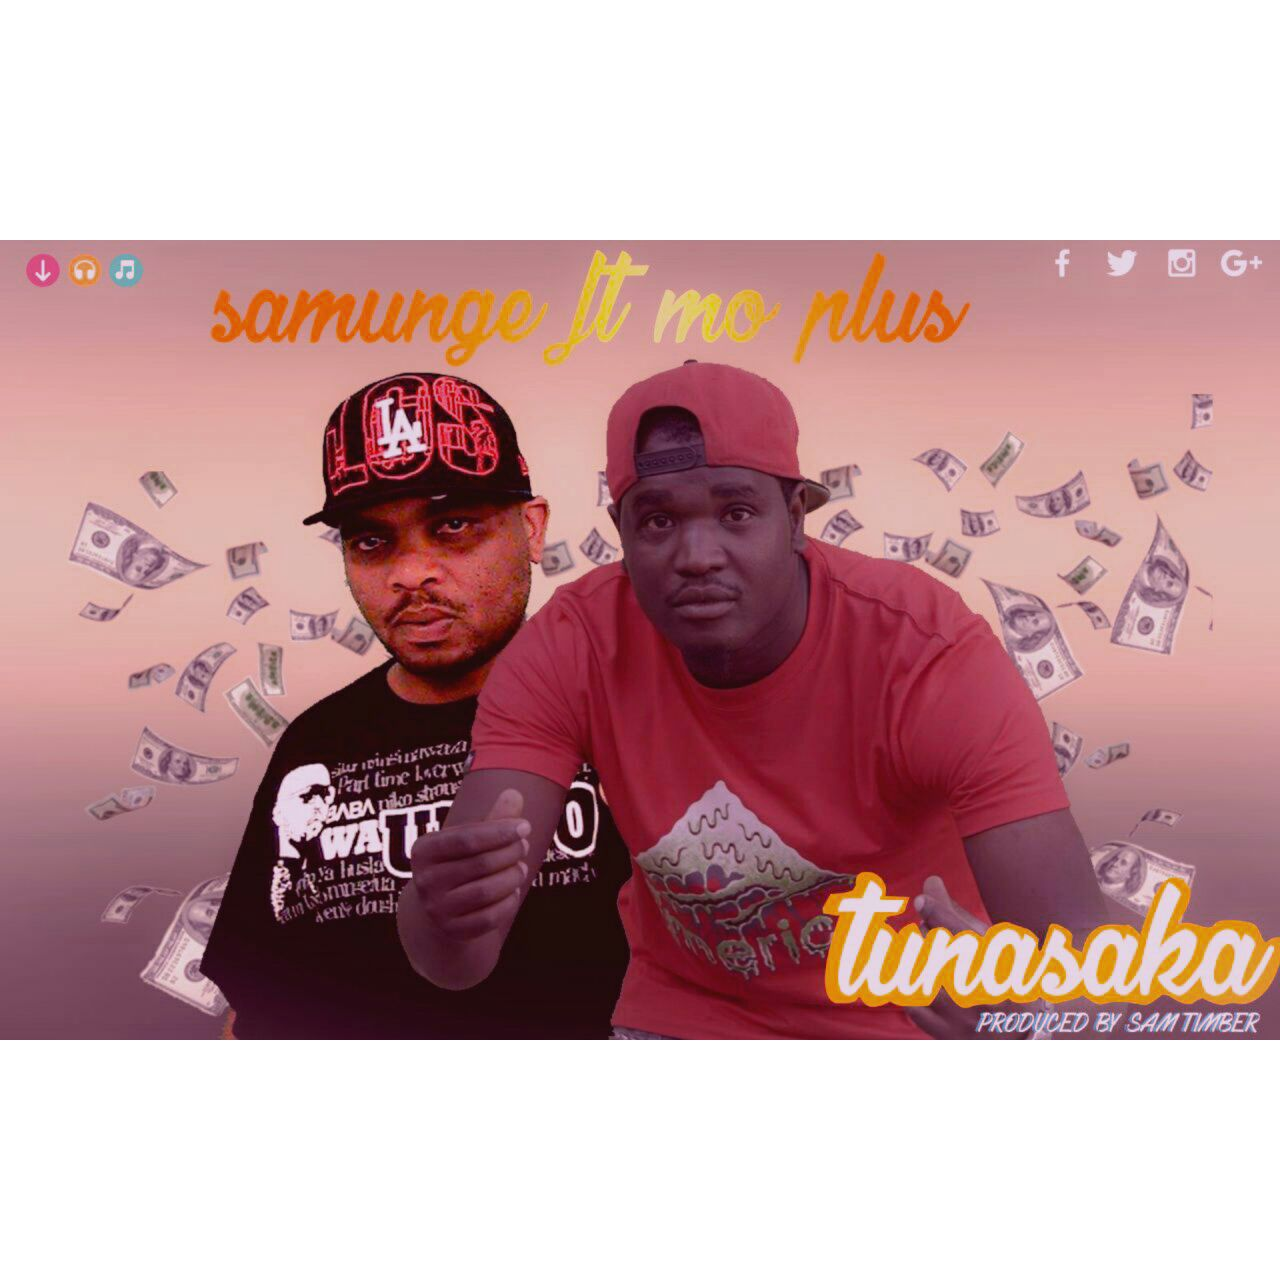 SamSamunge - Kingaleloo